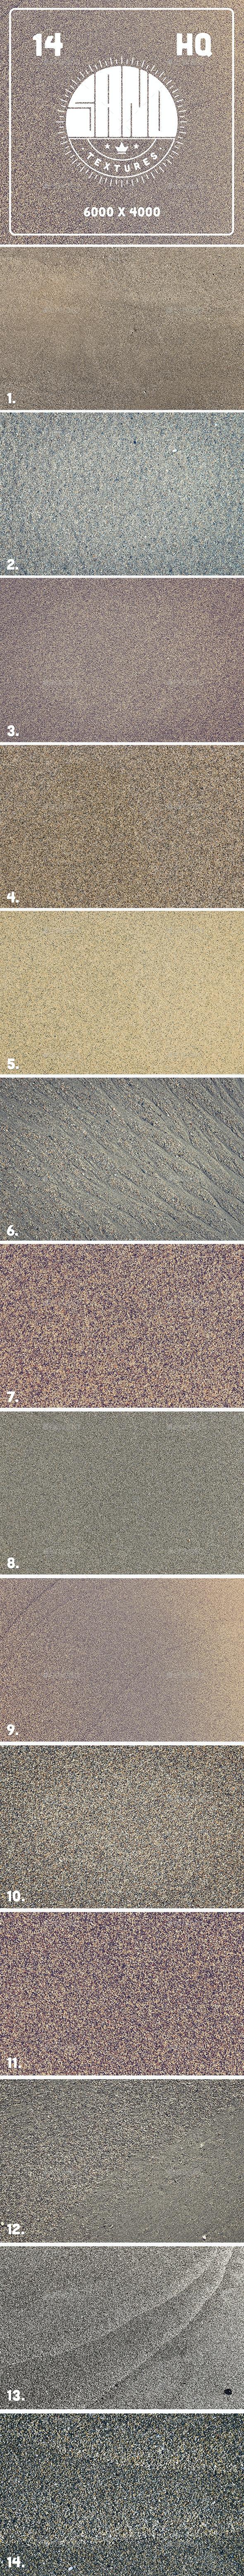 14 Sand Textures - Nature Textures